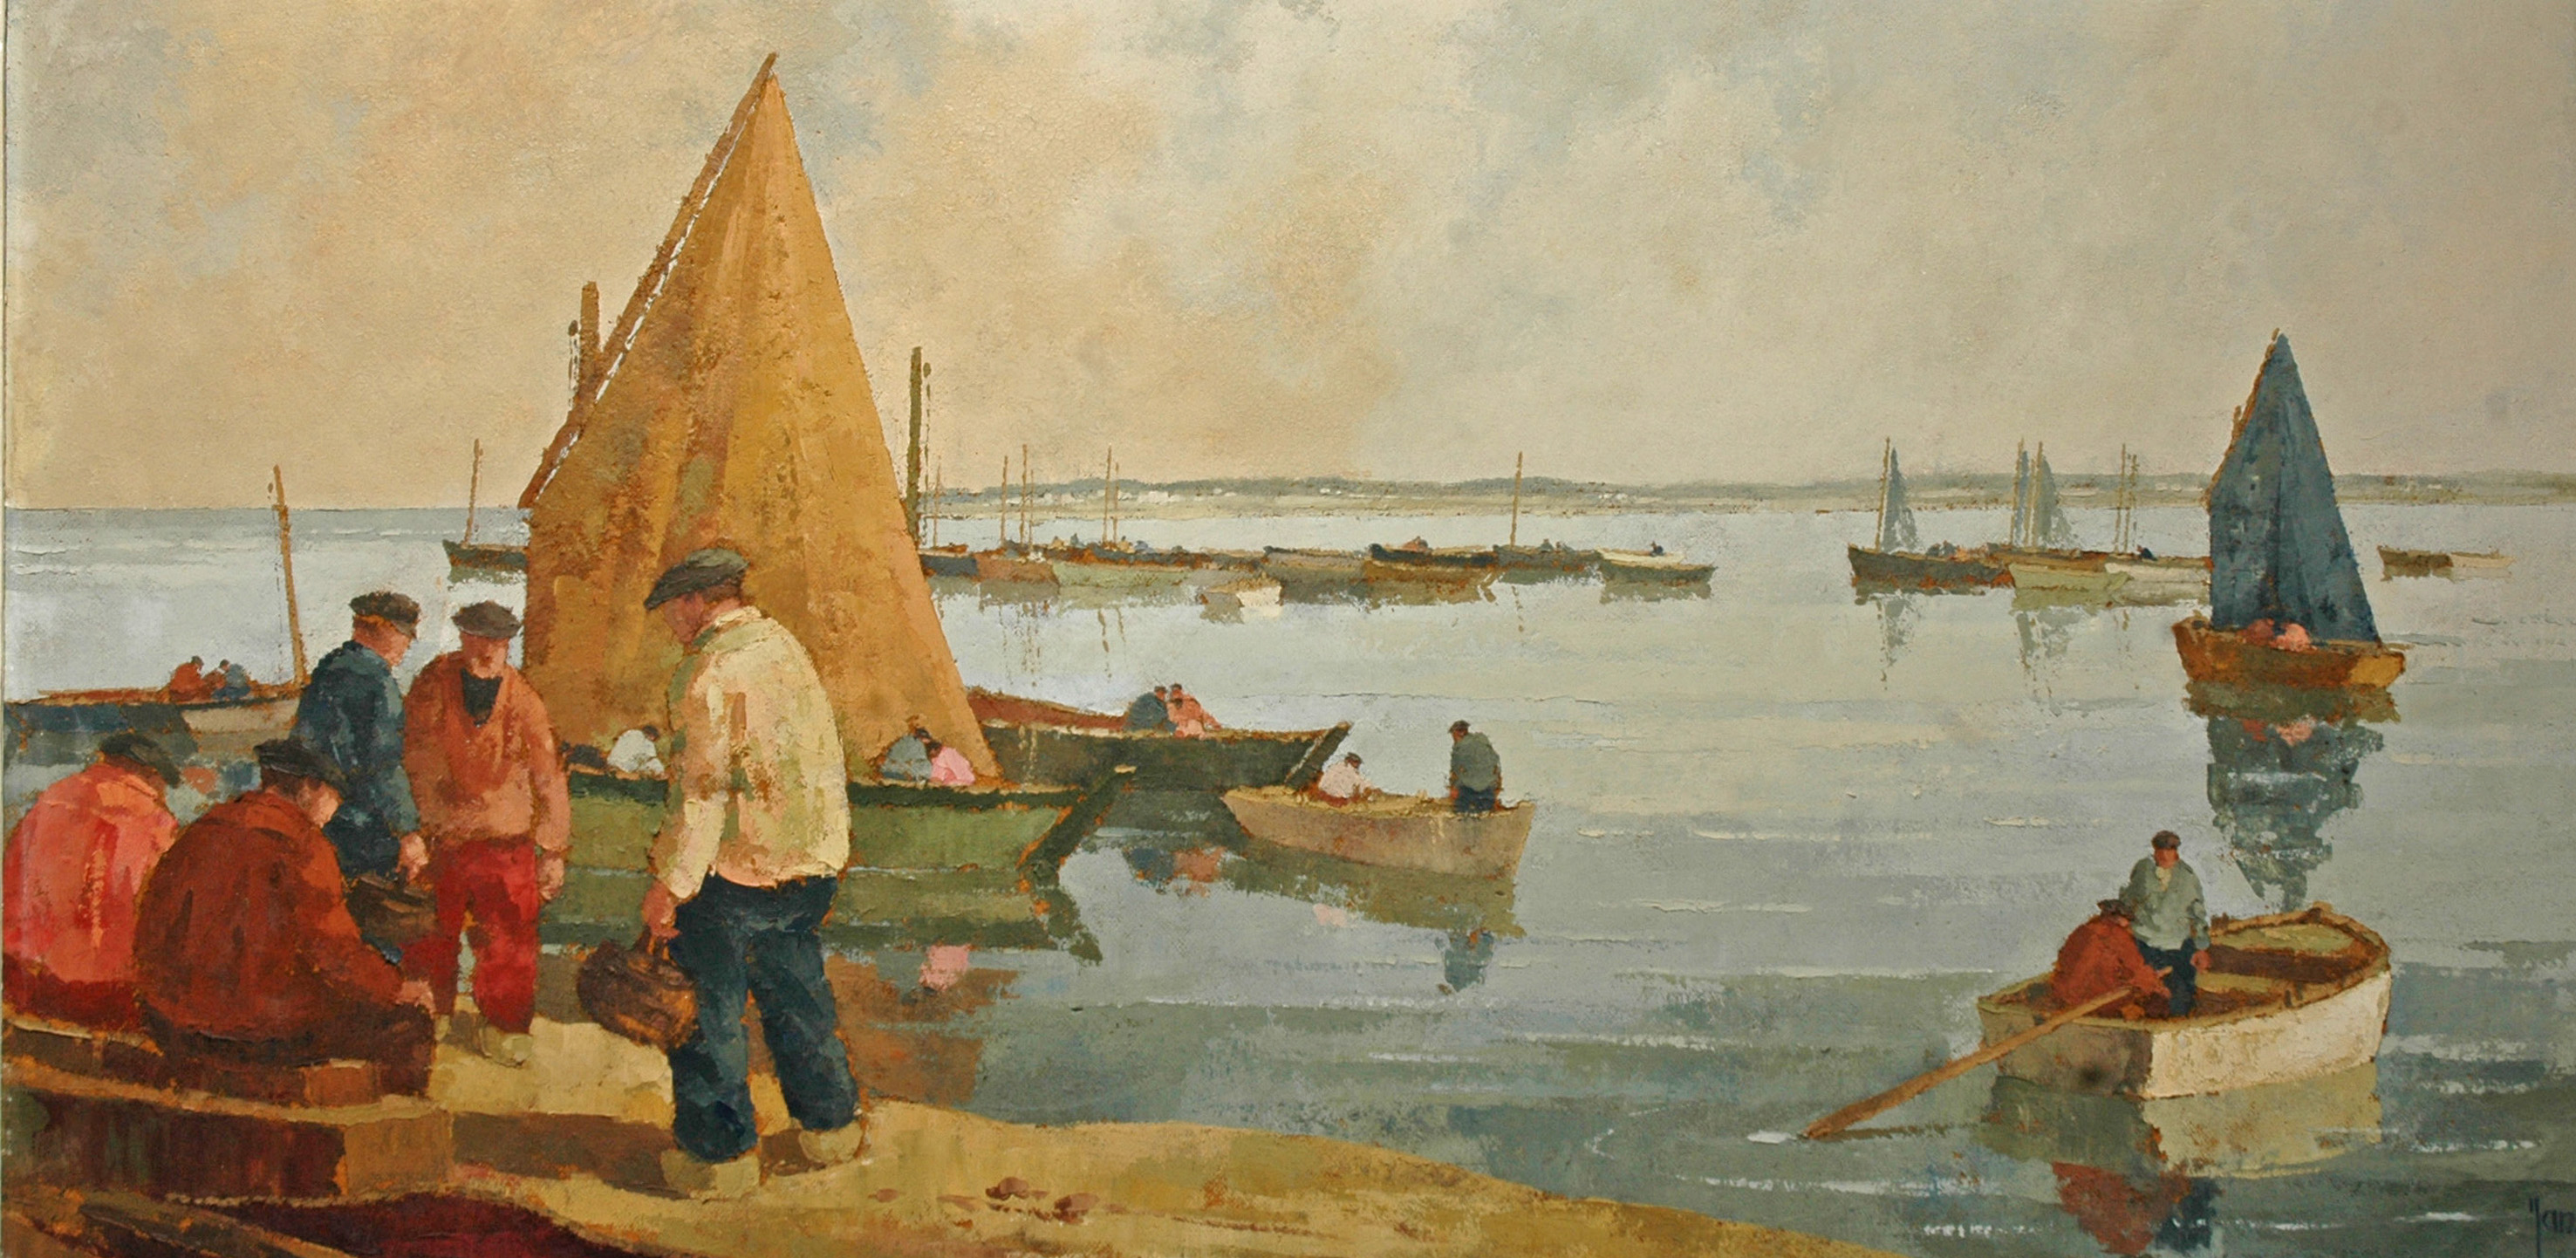 Robert Yan Un Grand Peintre Breton